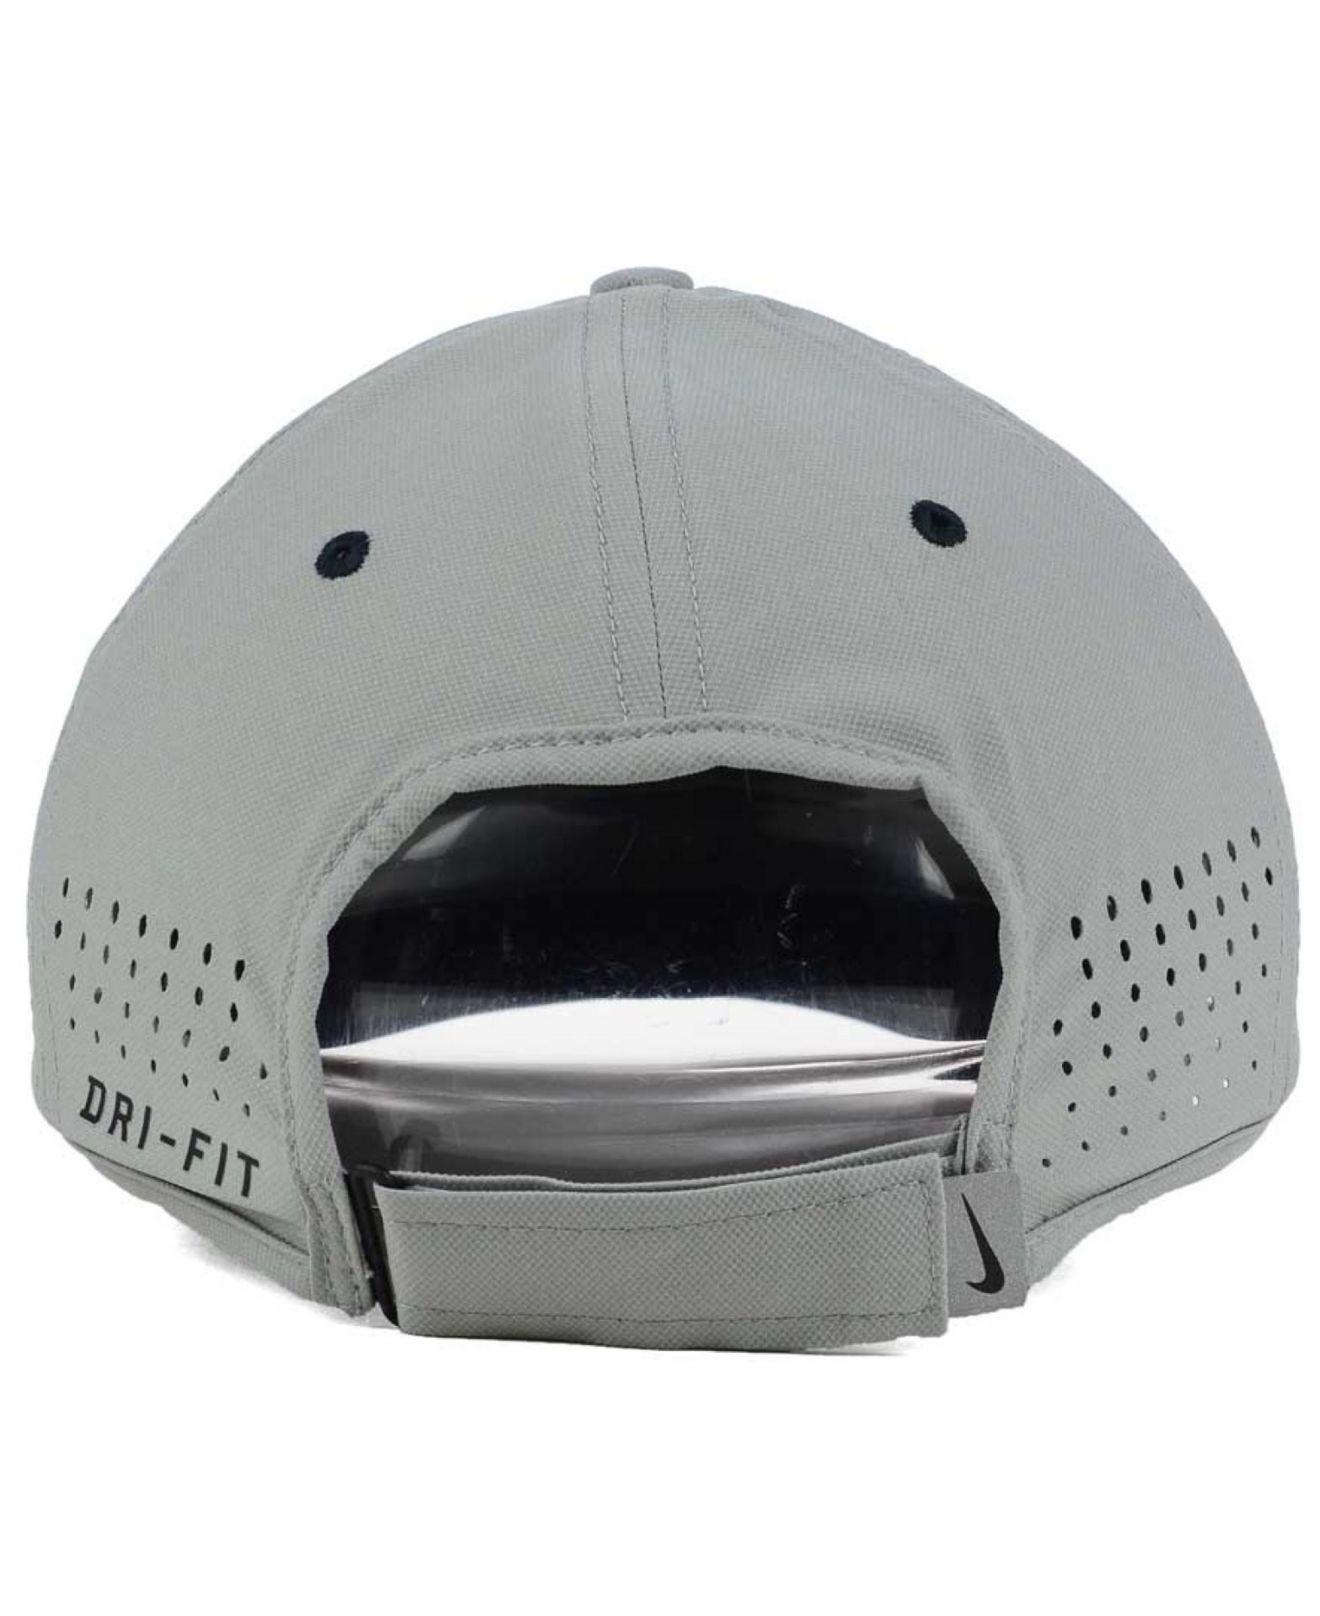 438906a83ceec ... canada lyst nike new york yankees vapor swoosh adjustable cap in gray  for men 5a4cd 8c5f3